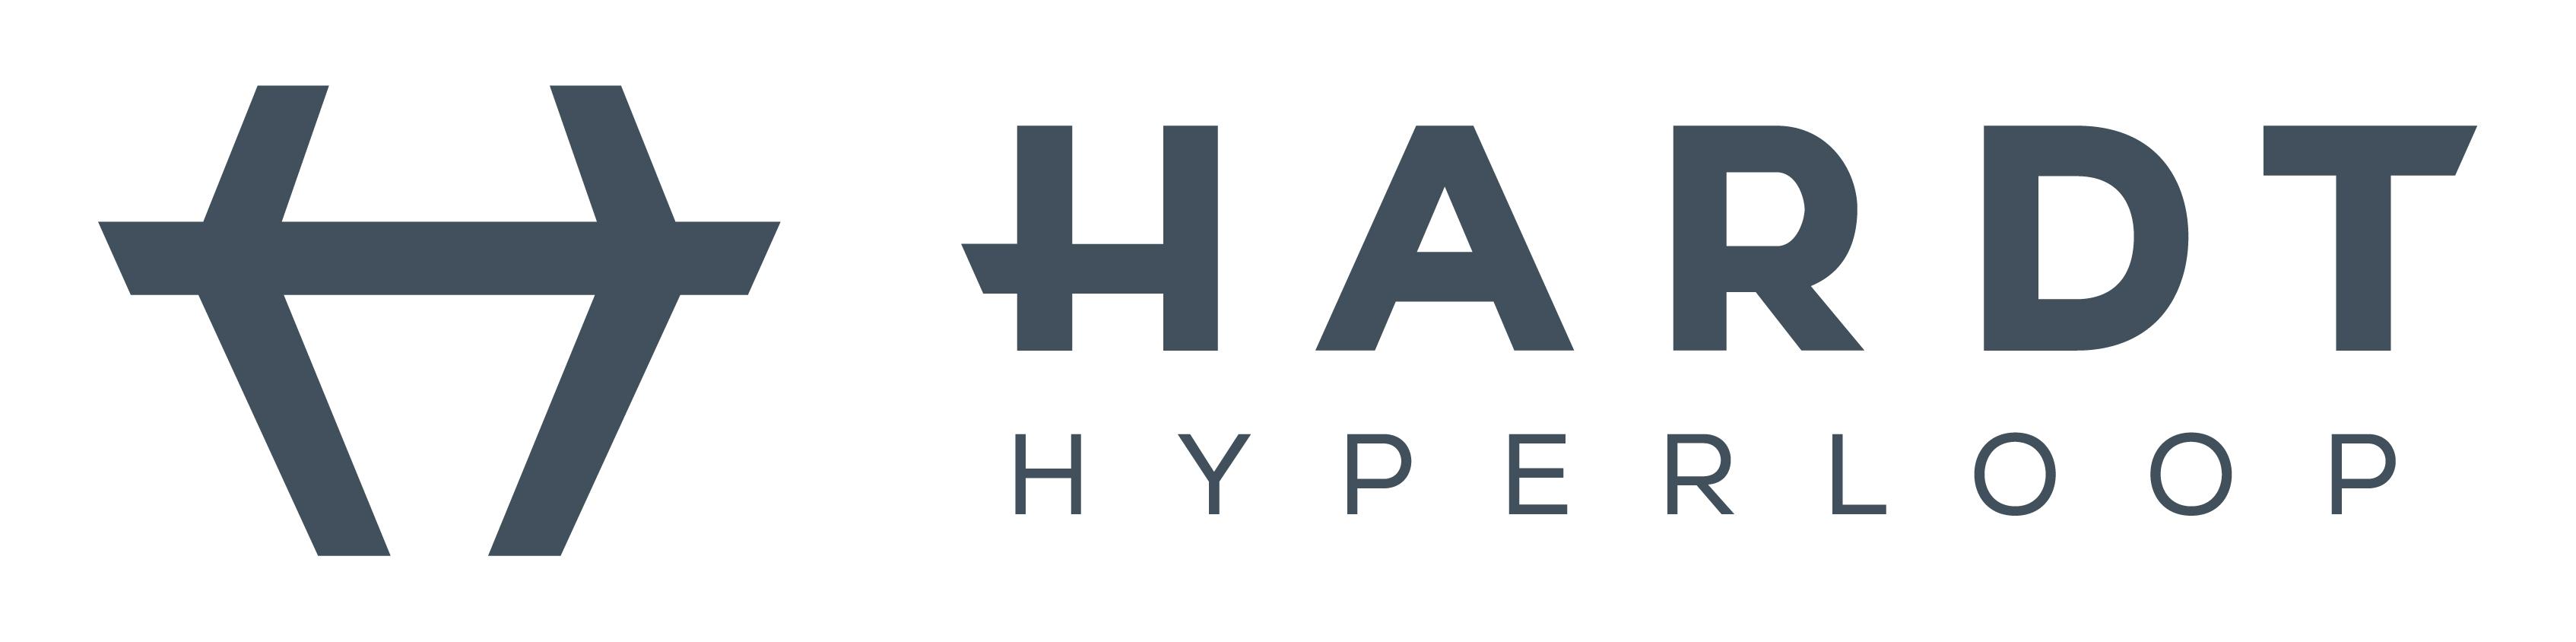 Hardt logo